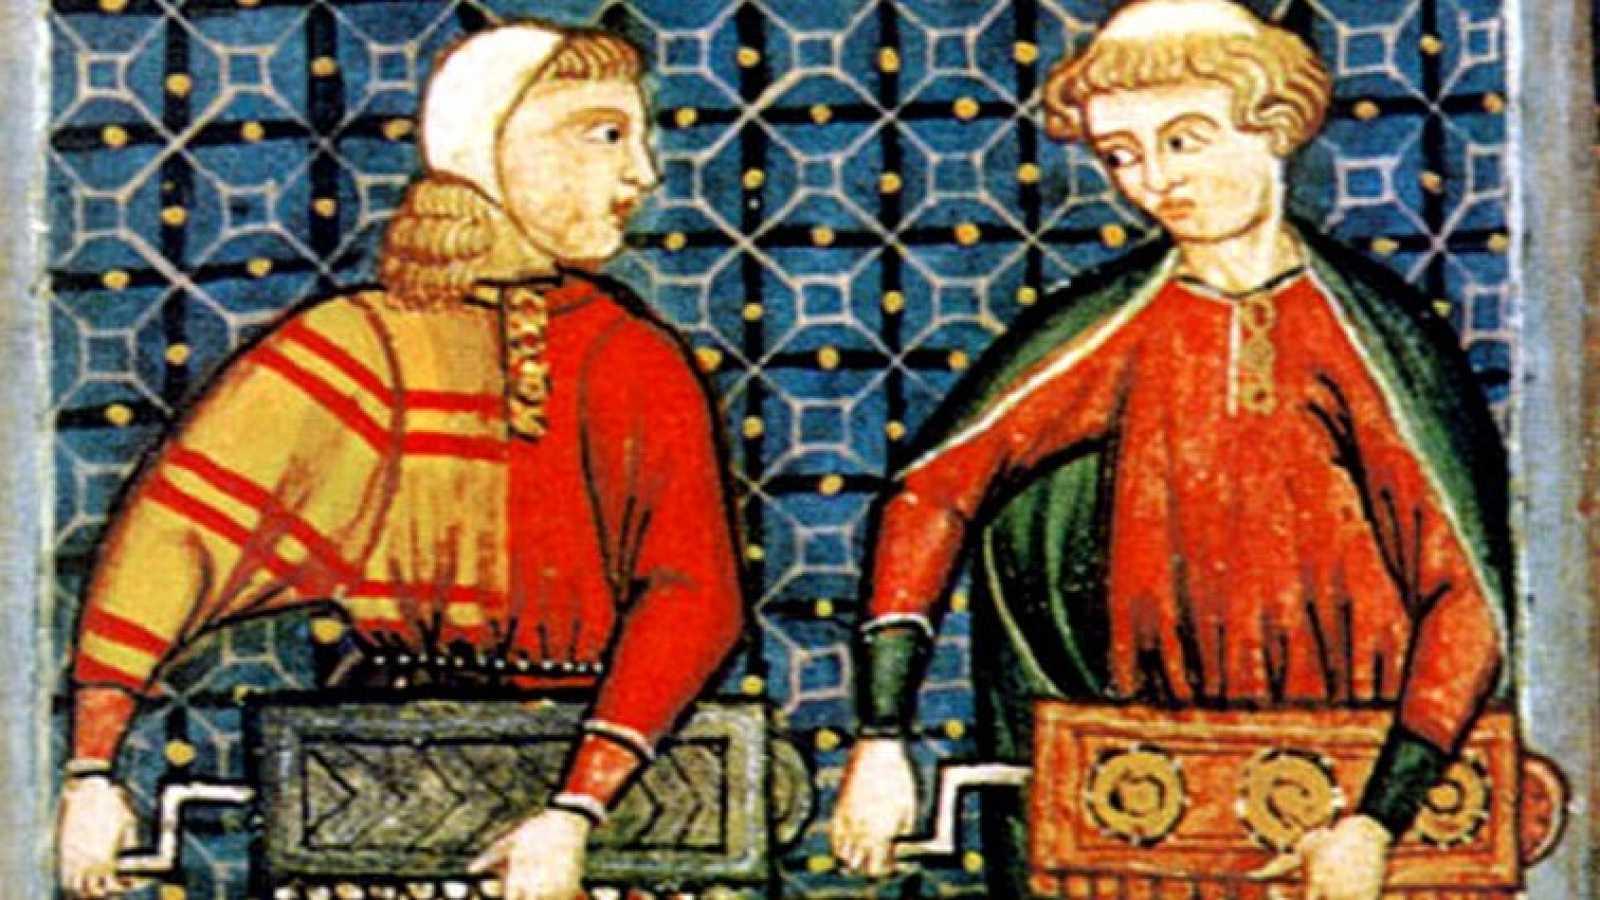 Música antigua - Alfonso X el Sabio ( II ) - 18/05/21 - escuchar ahora